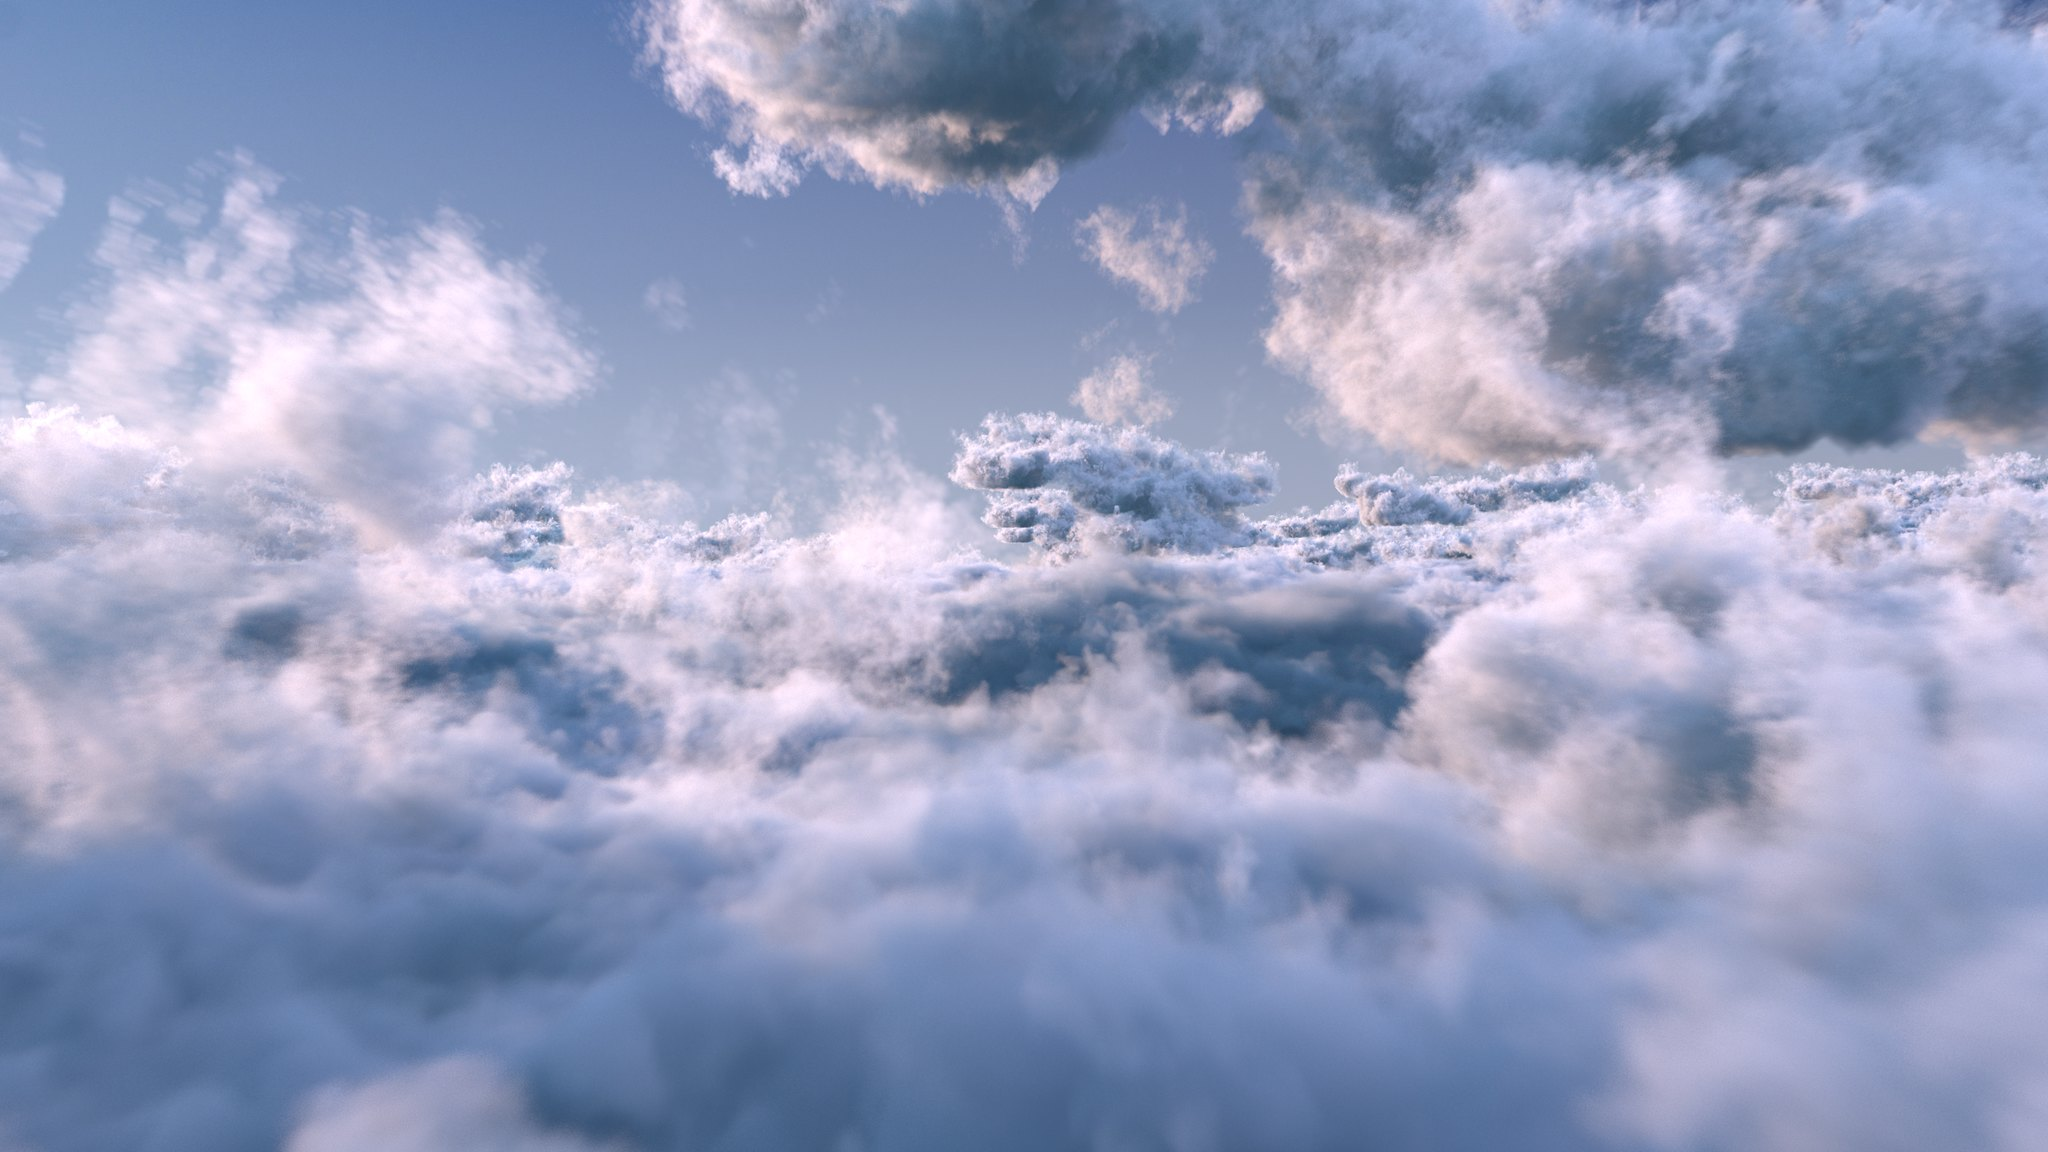 clouds by binary asci